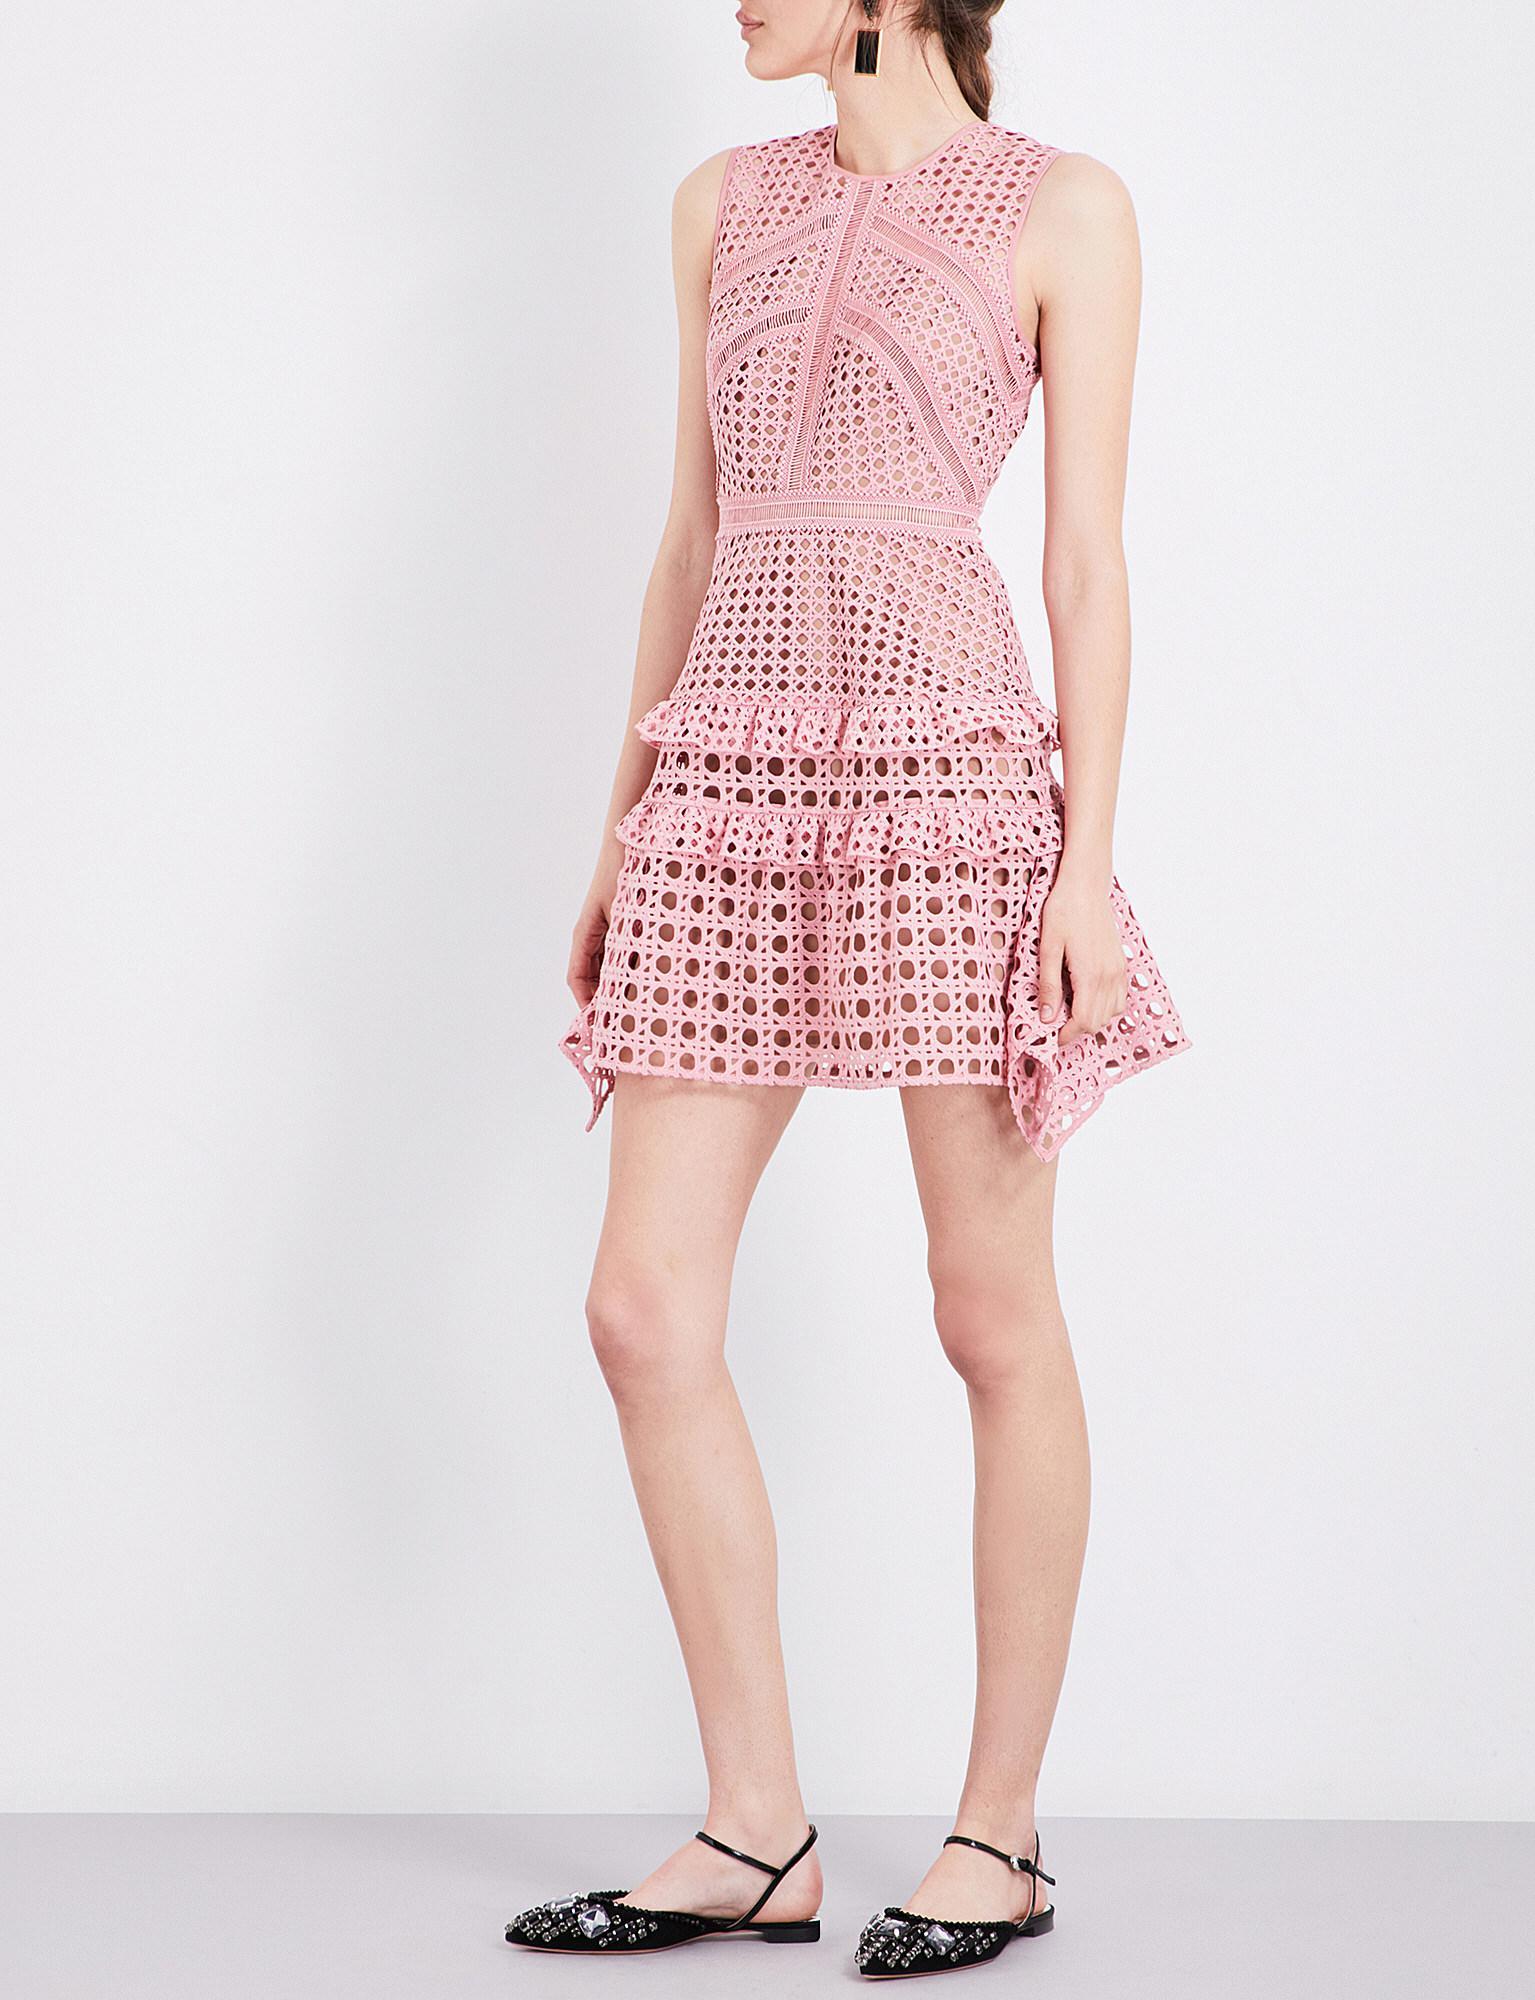 24164af84 Lyst - Self-Portrait Frilled Lace Mini Dress in Pink